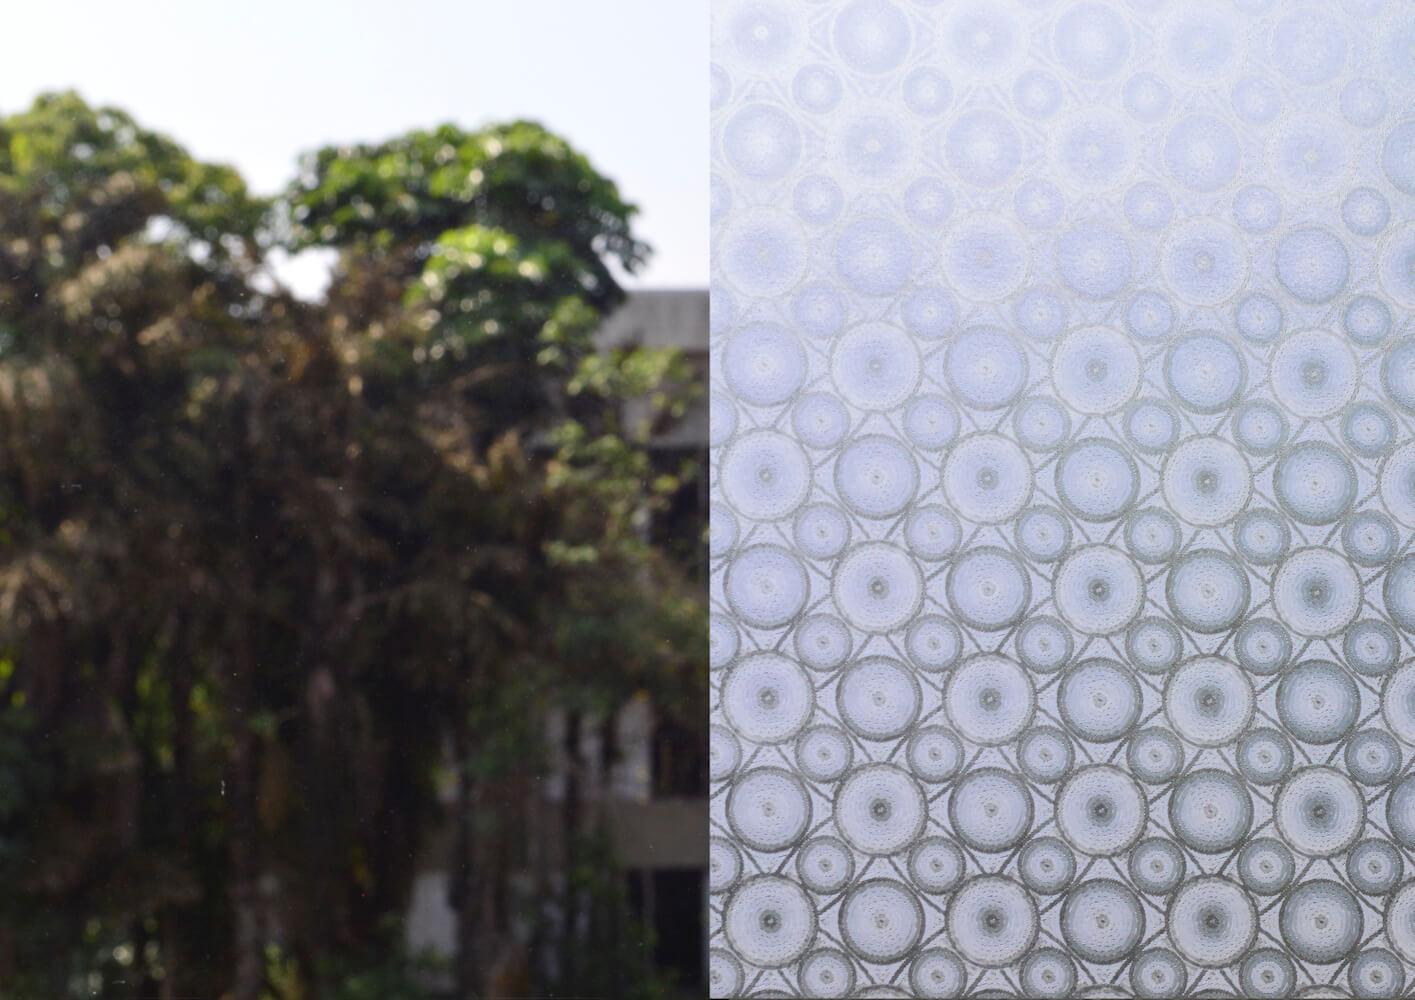 Adesivo para Vidro Jateado Micro Esfera